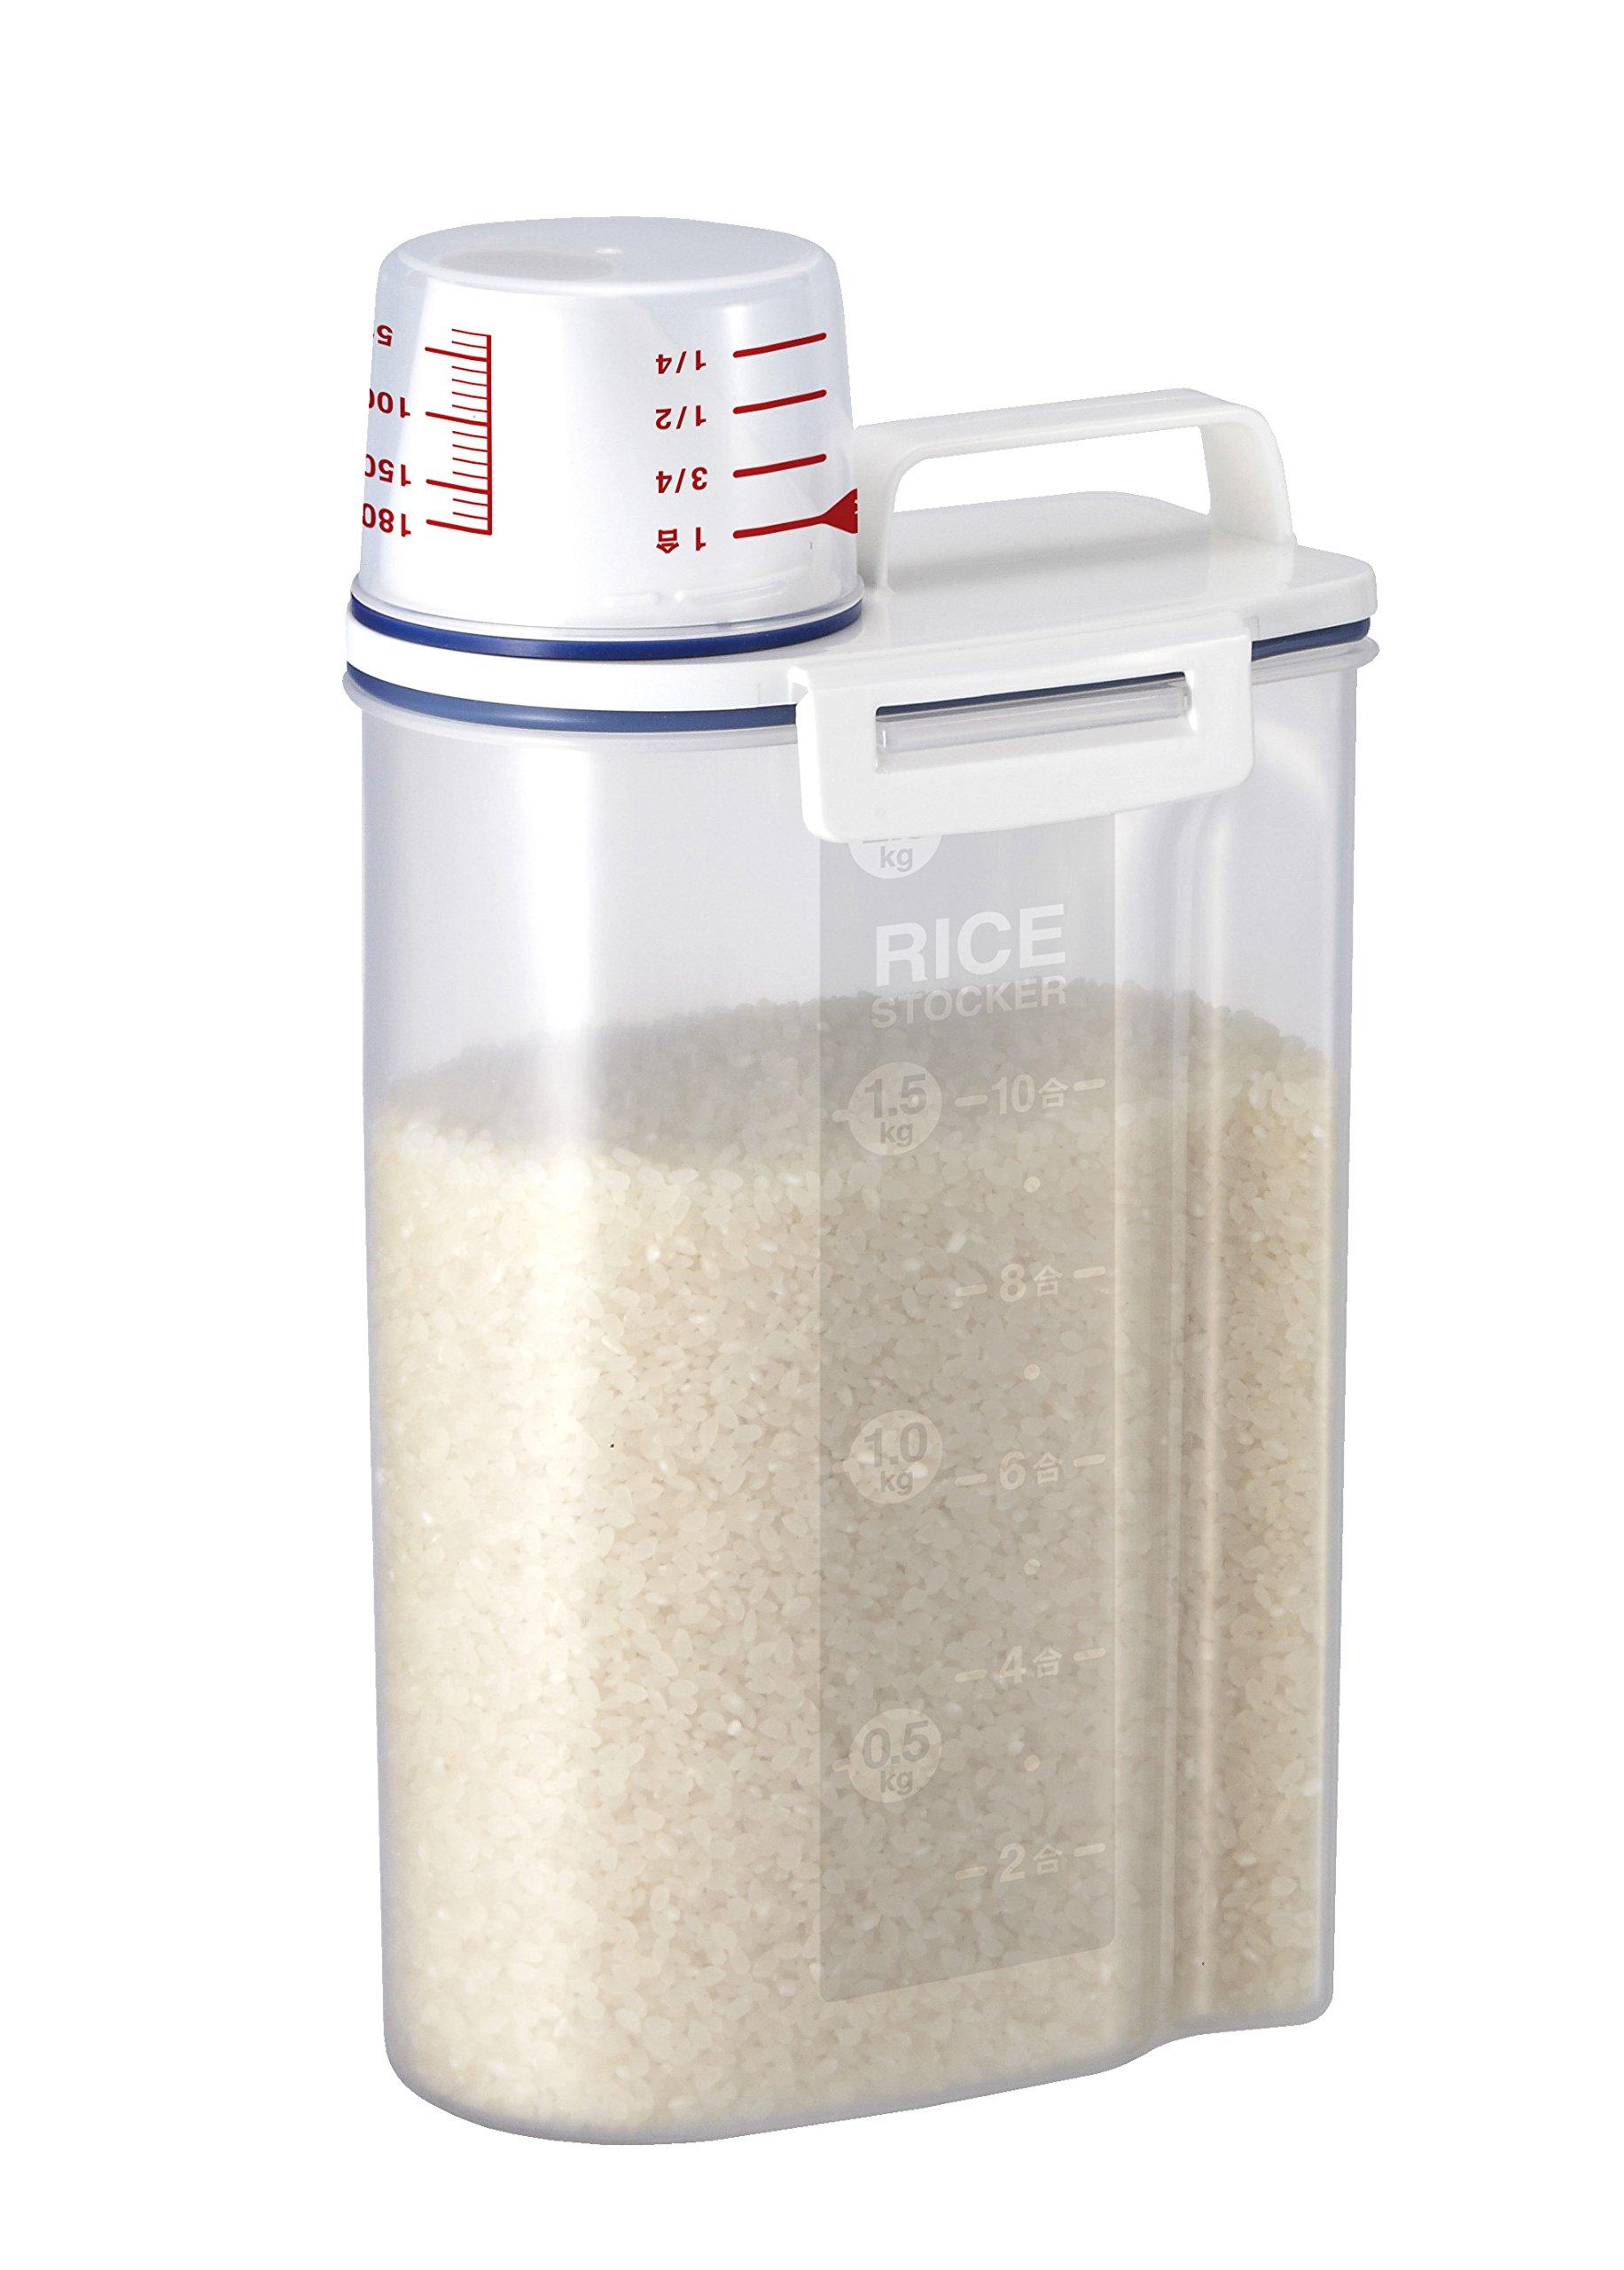 Rice Storage Bin with Pour Spout by Asvel 2kg